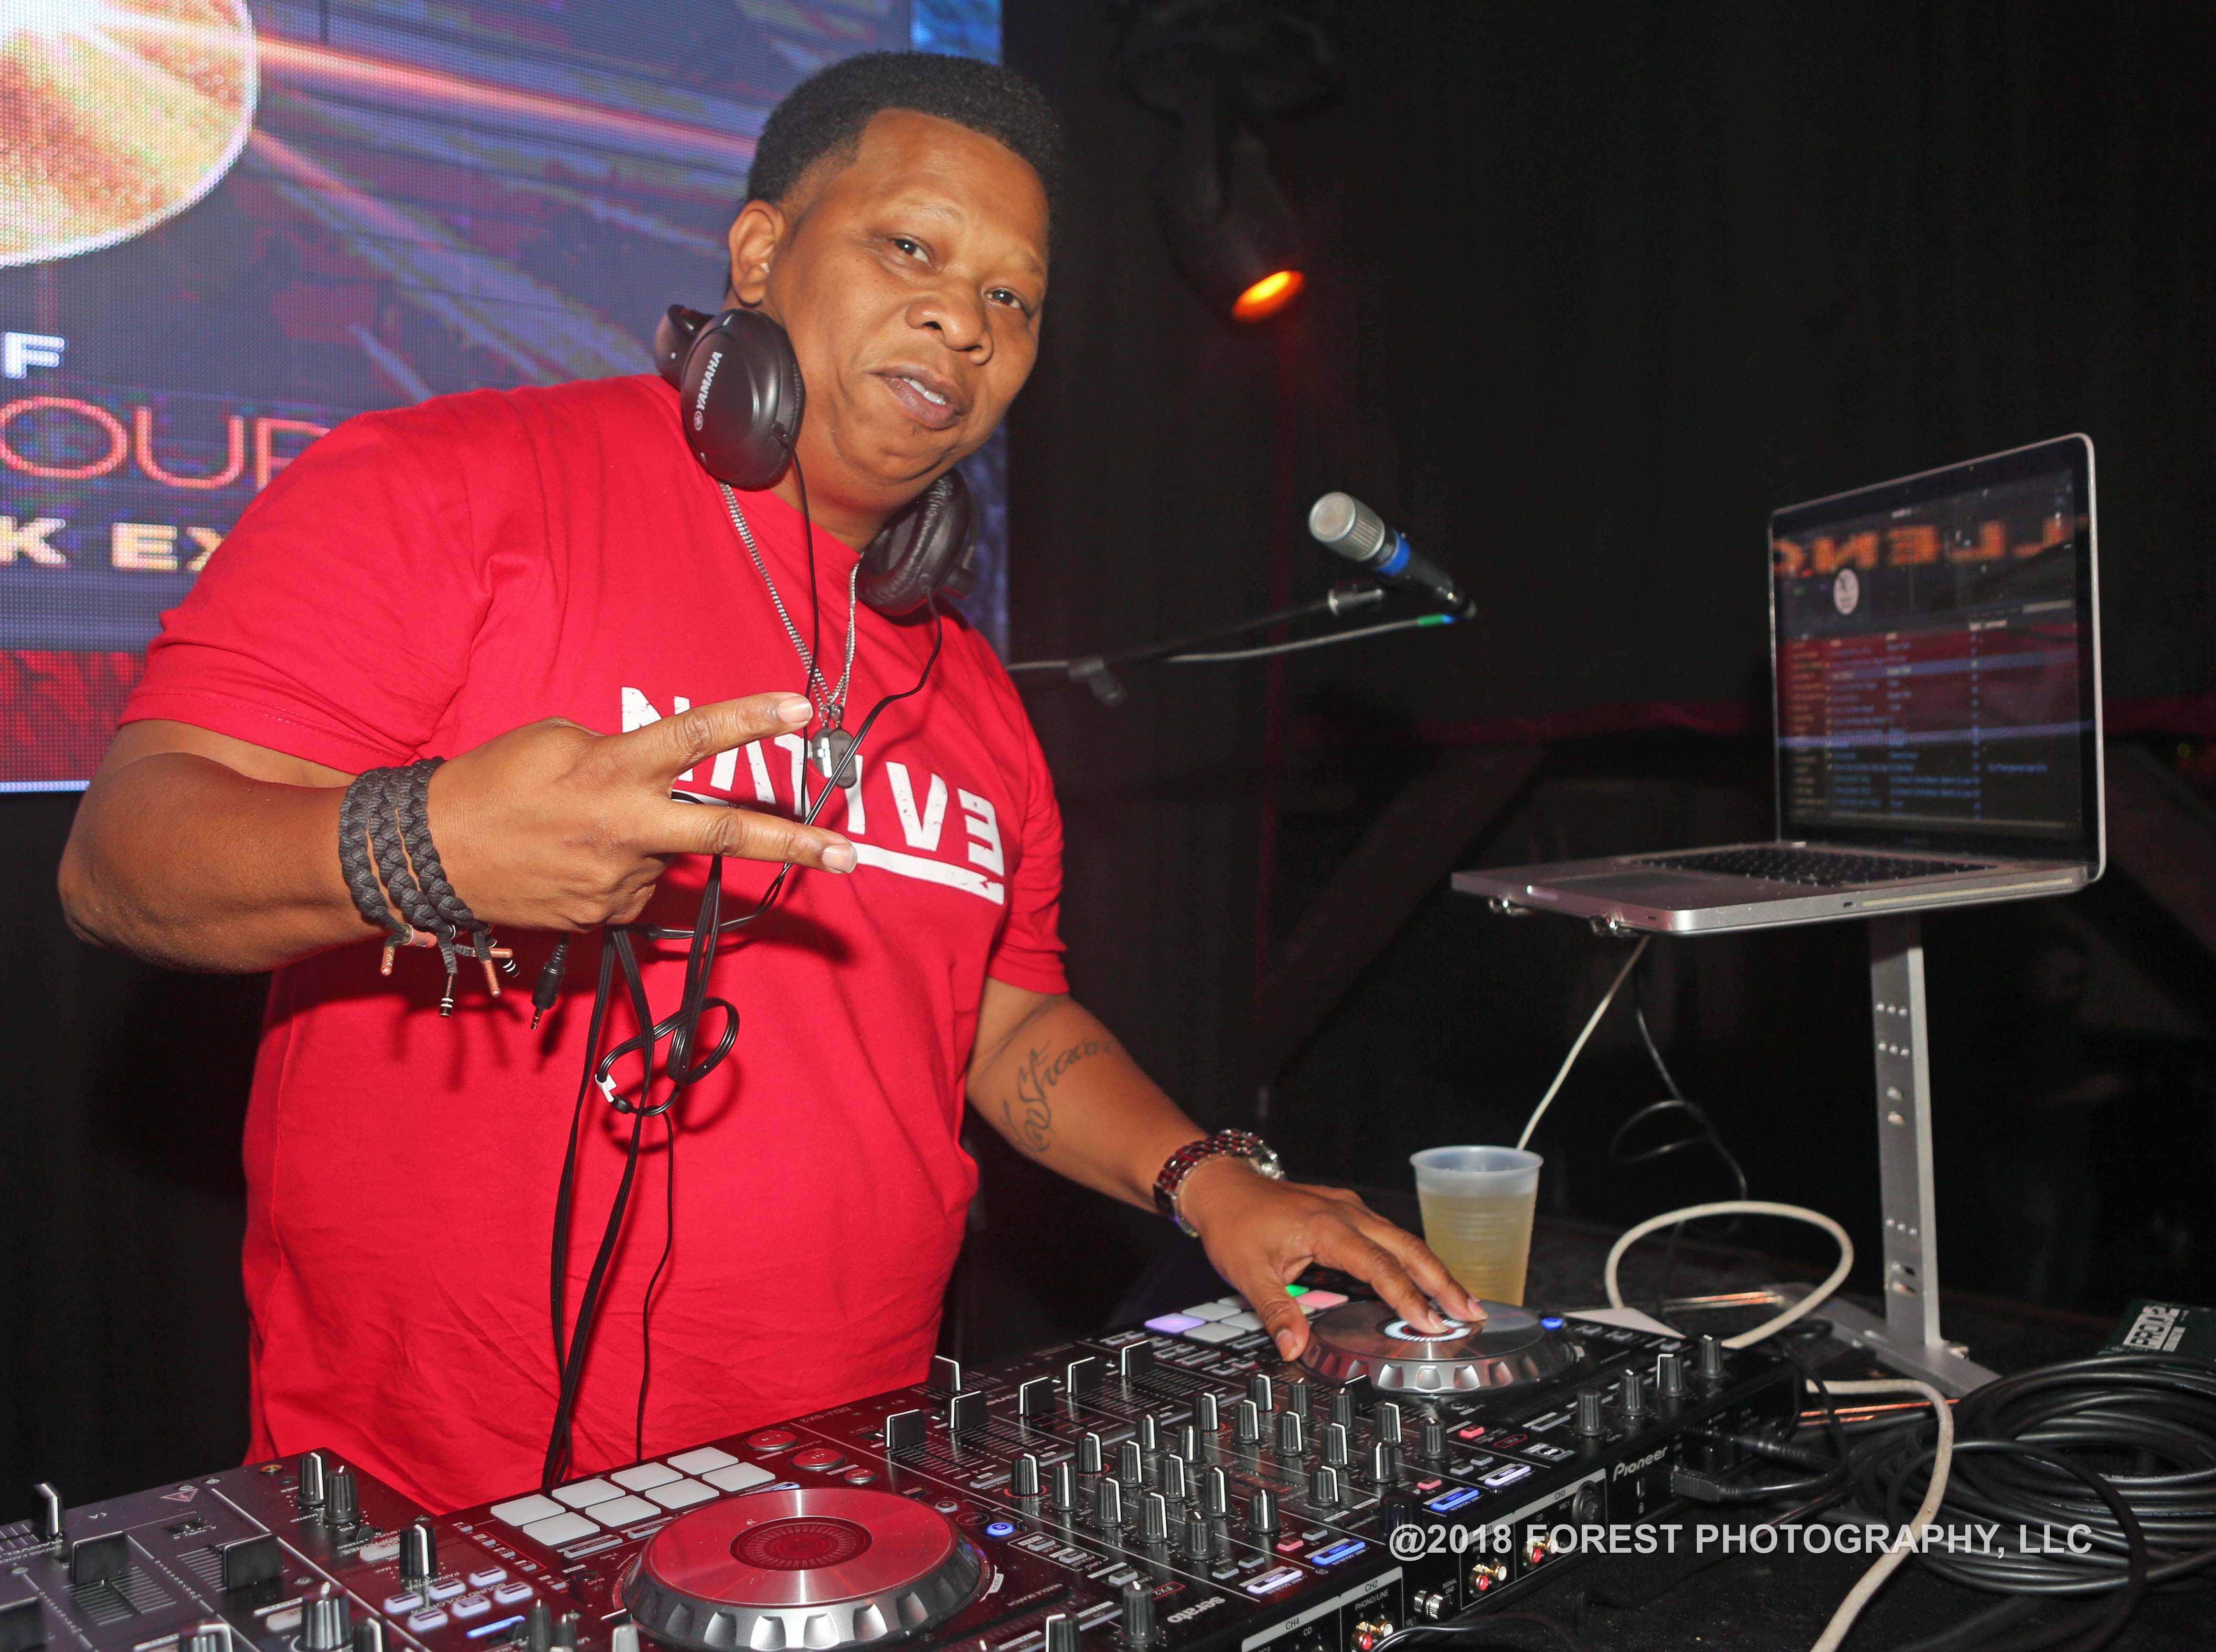 DJ Mannie Fresh